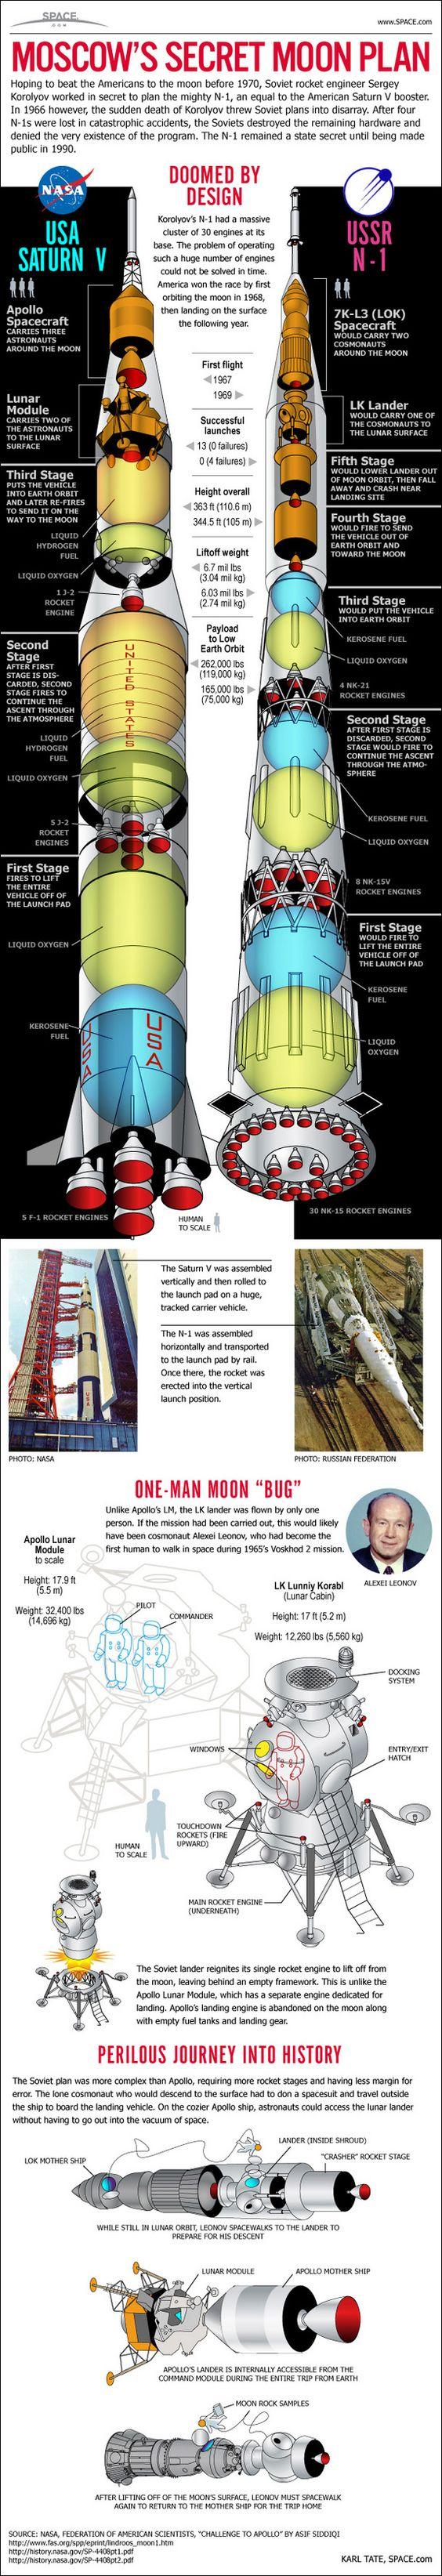 soviets moon landing rockets - photo #27